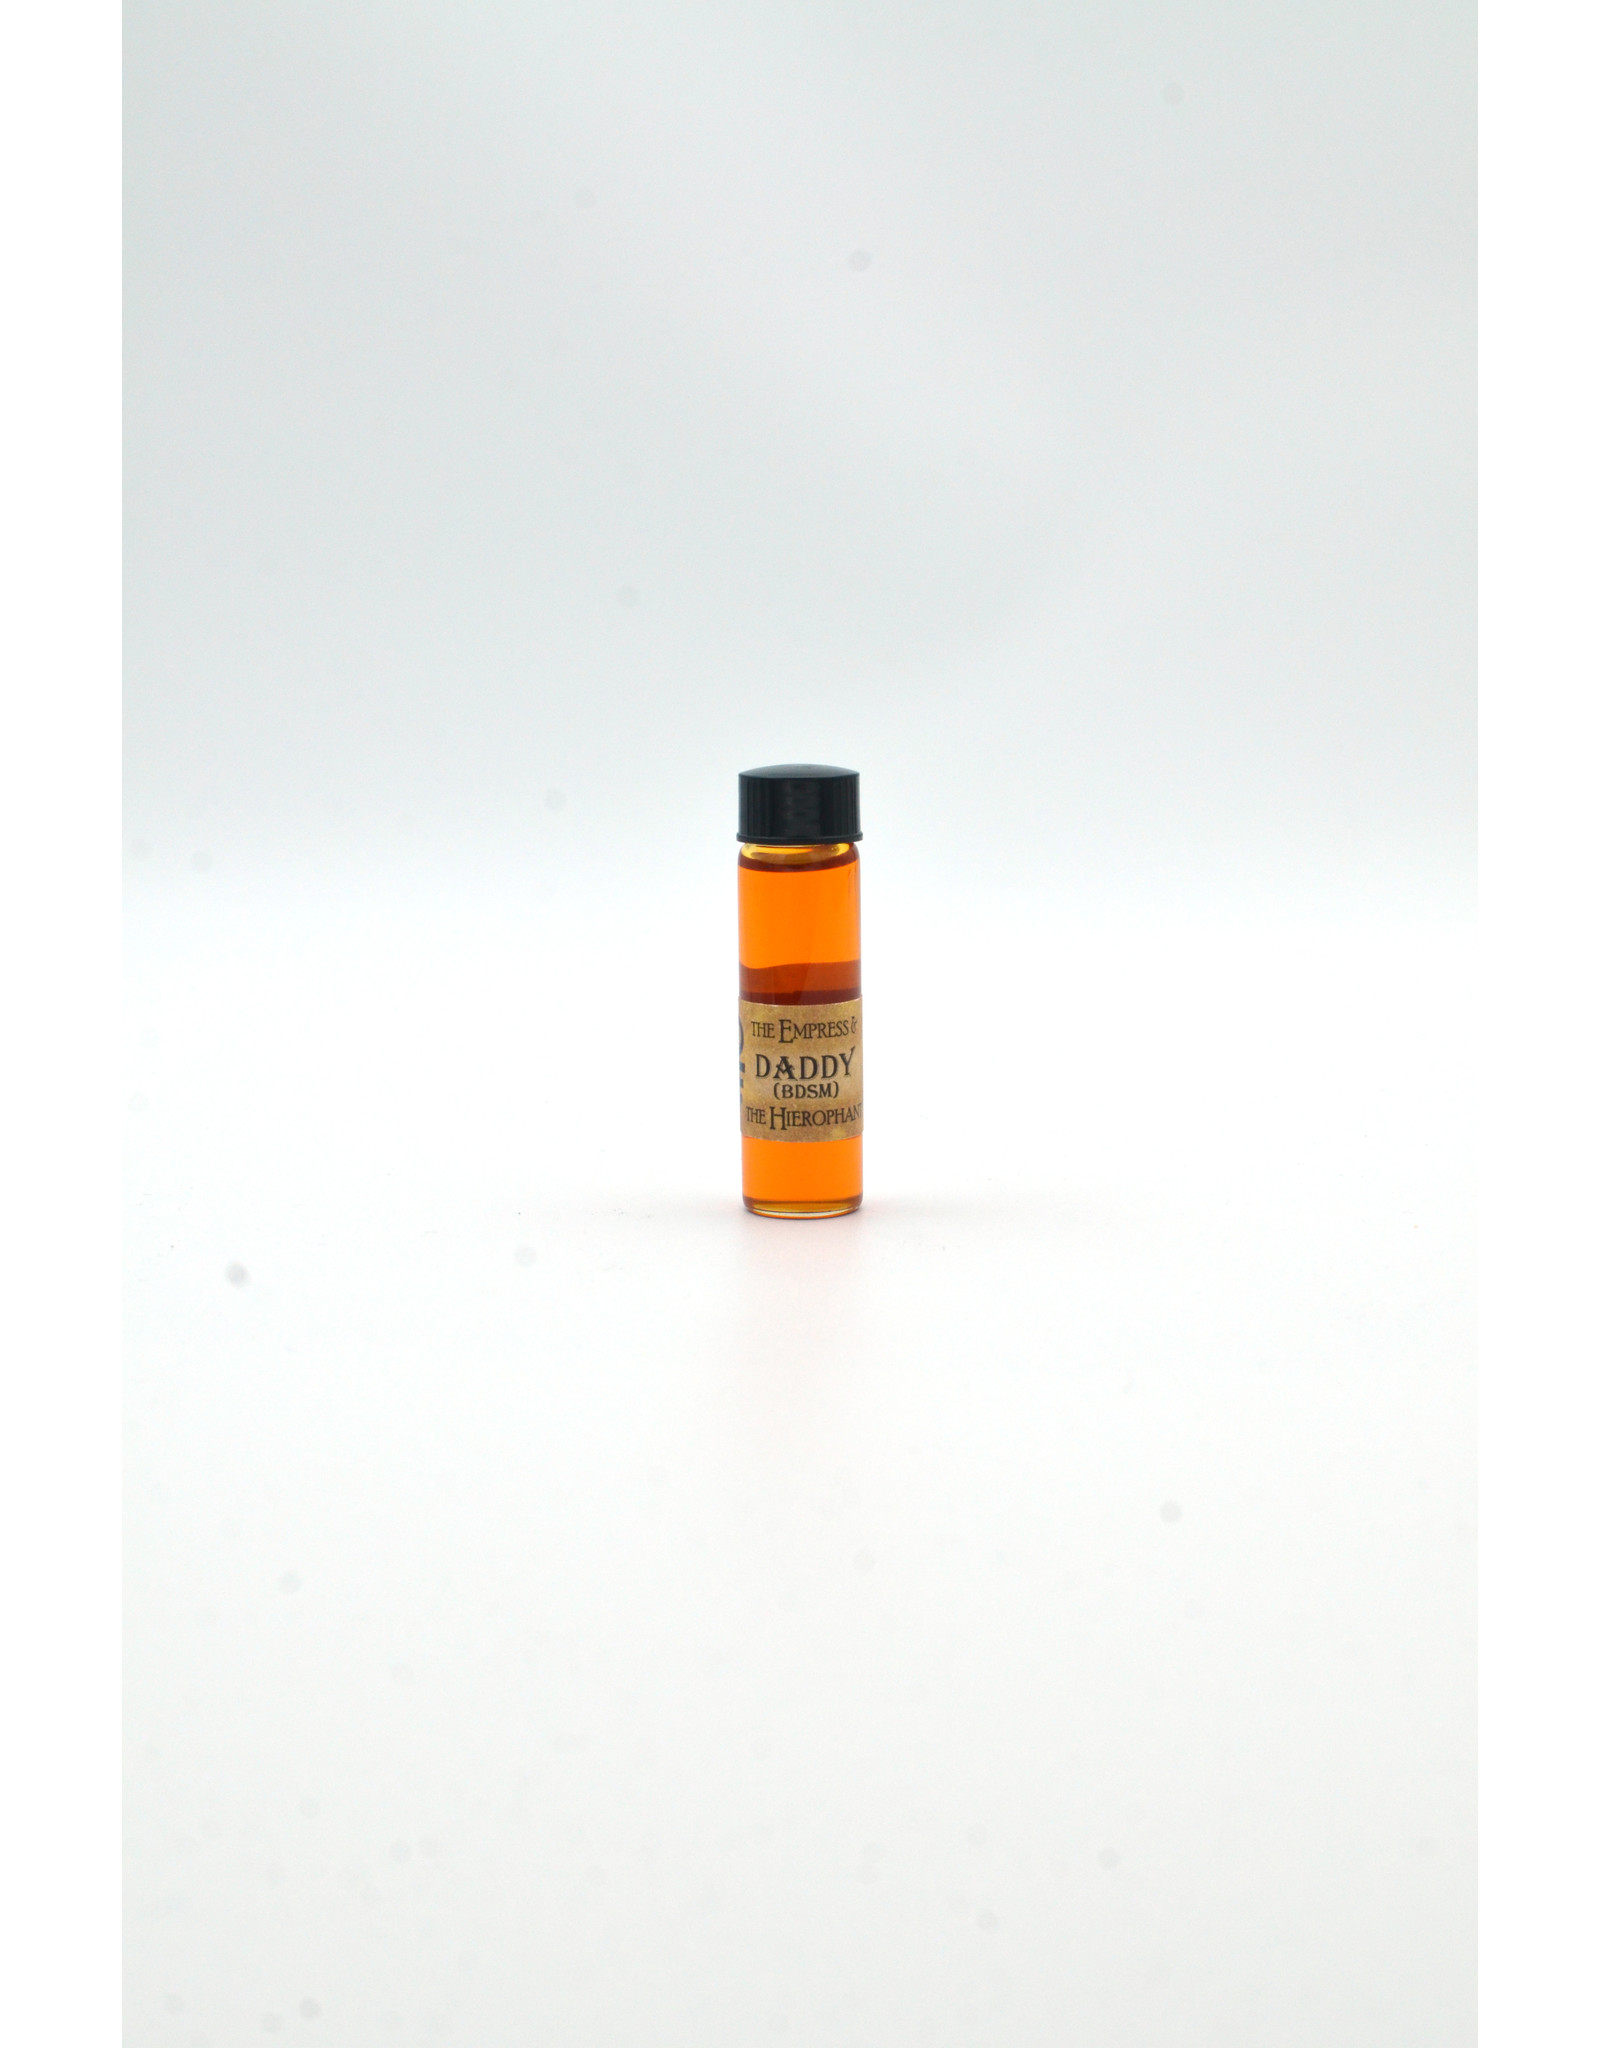 Daddy Sex Magickal Oil 2 Dram Bottle